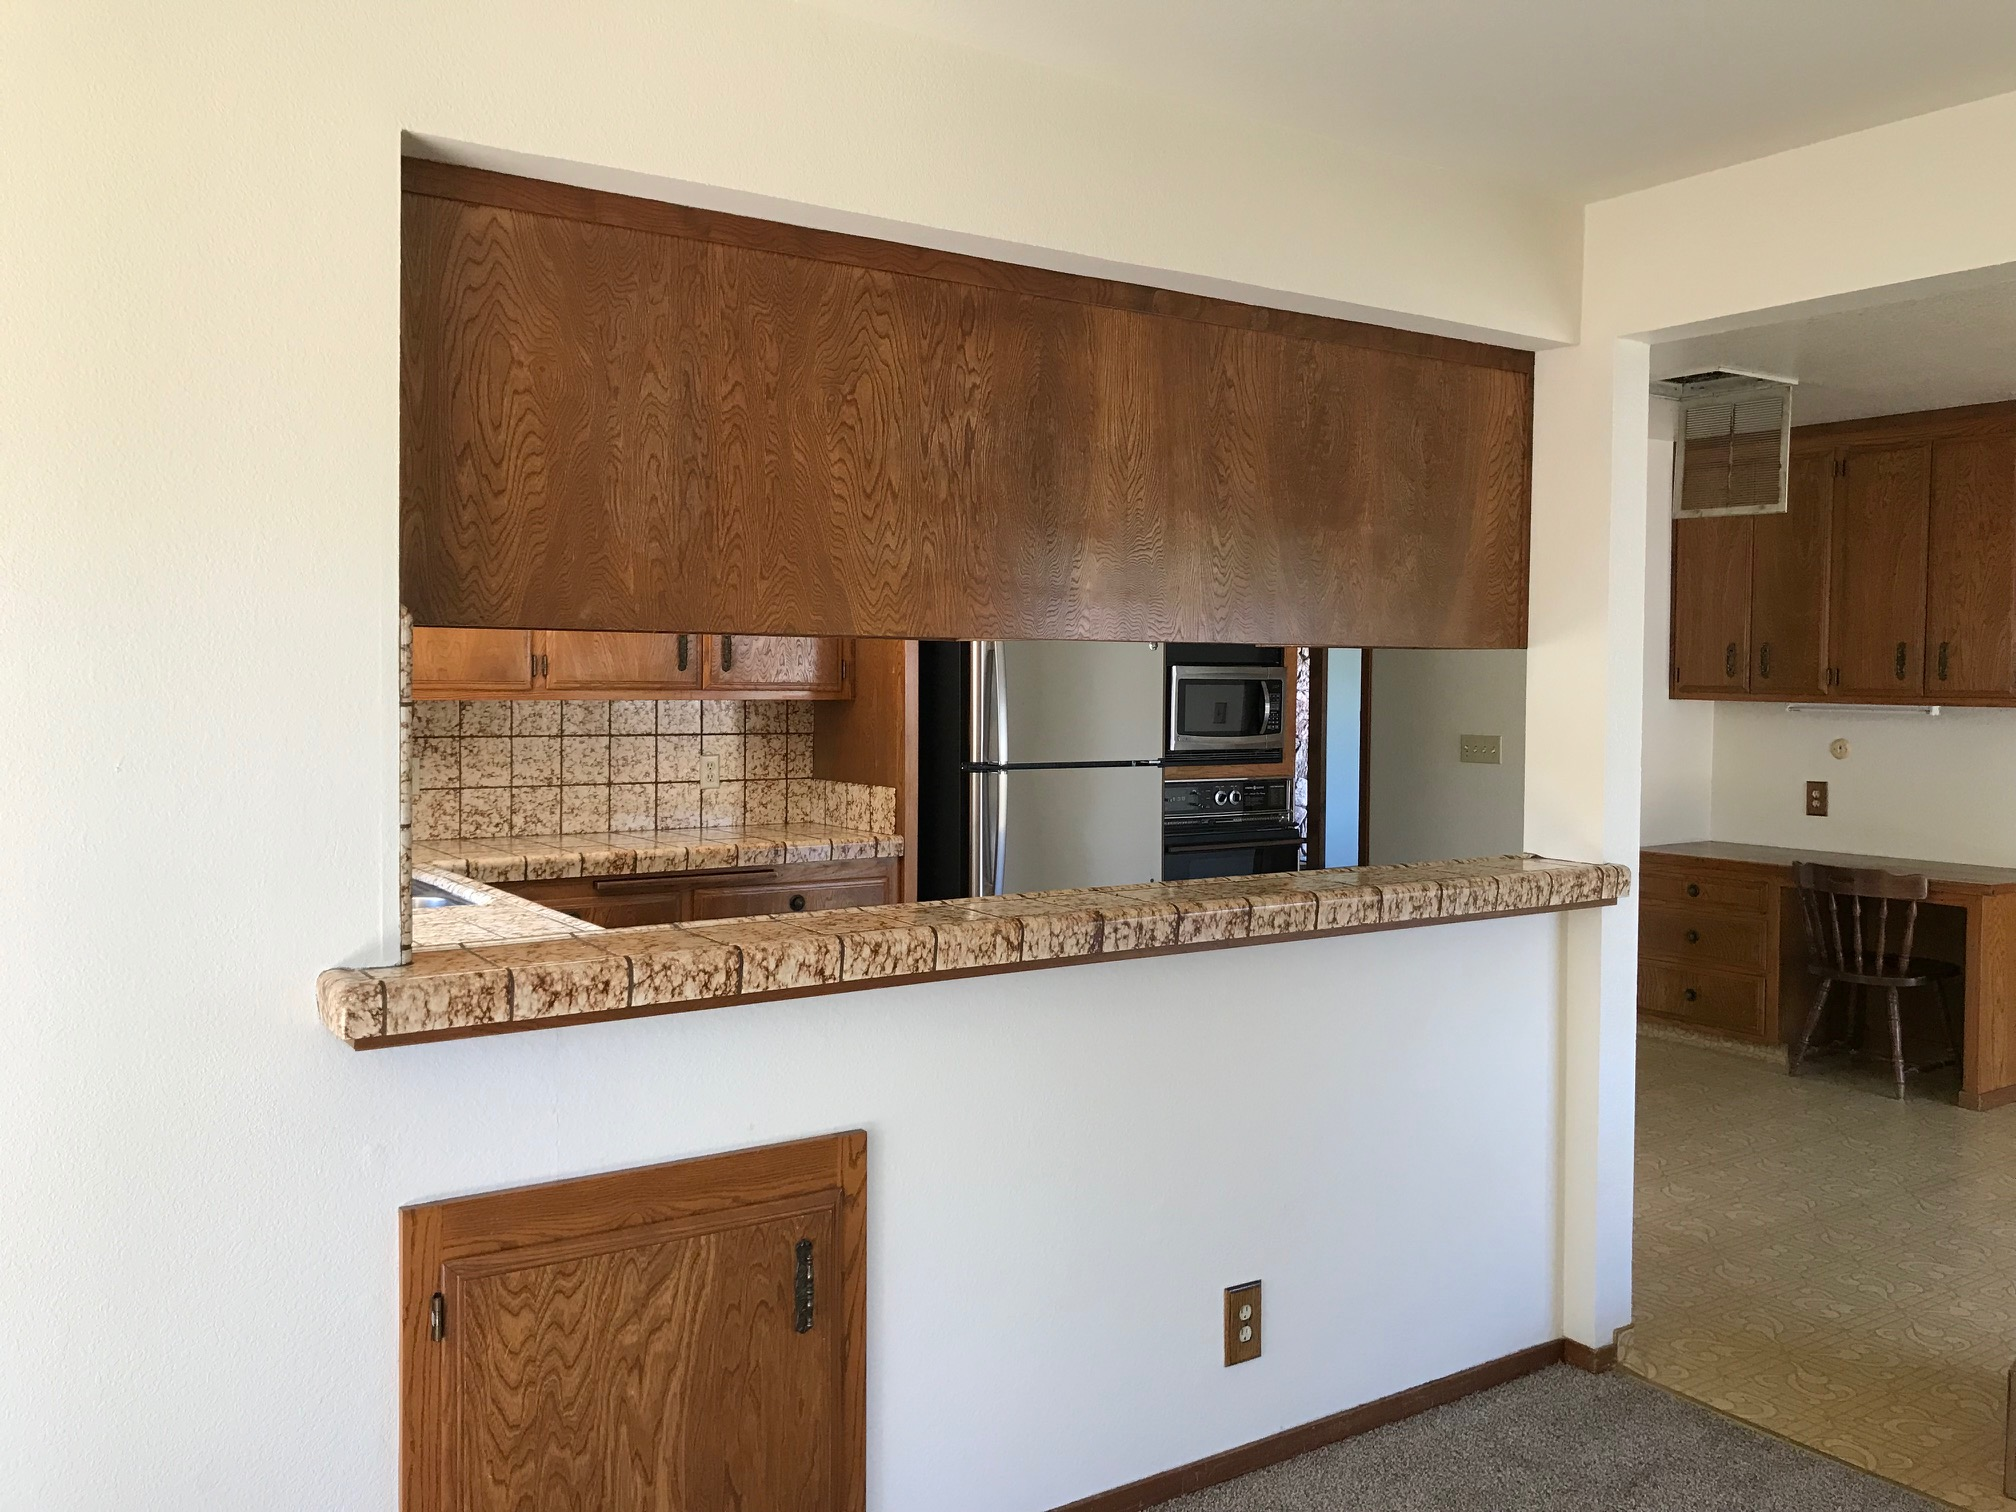 3509 Twin Oaks Court, Napa, CA, 94558 - 5